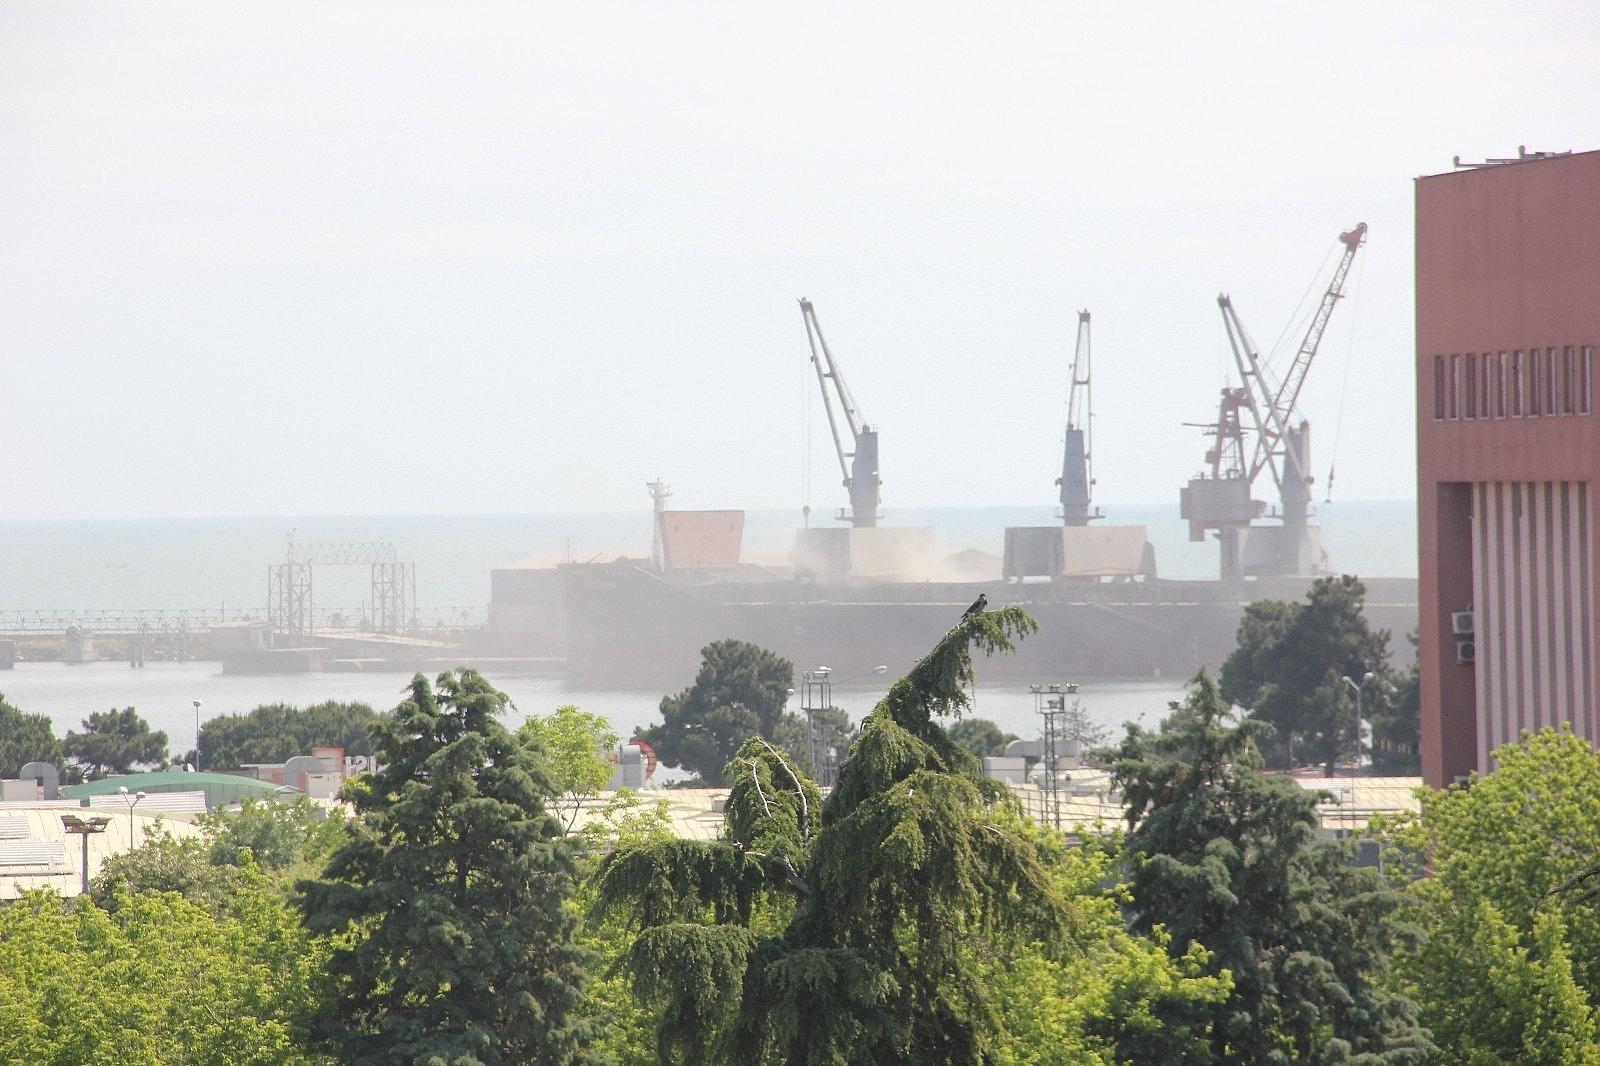 2021/06/samsun-limaninda-toz-dumana-karisti-20210605AW33-2.jpg